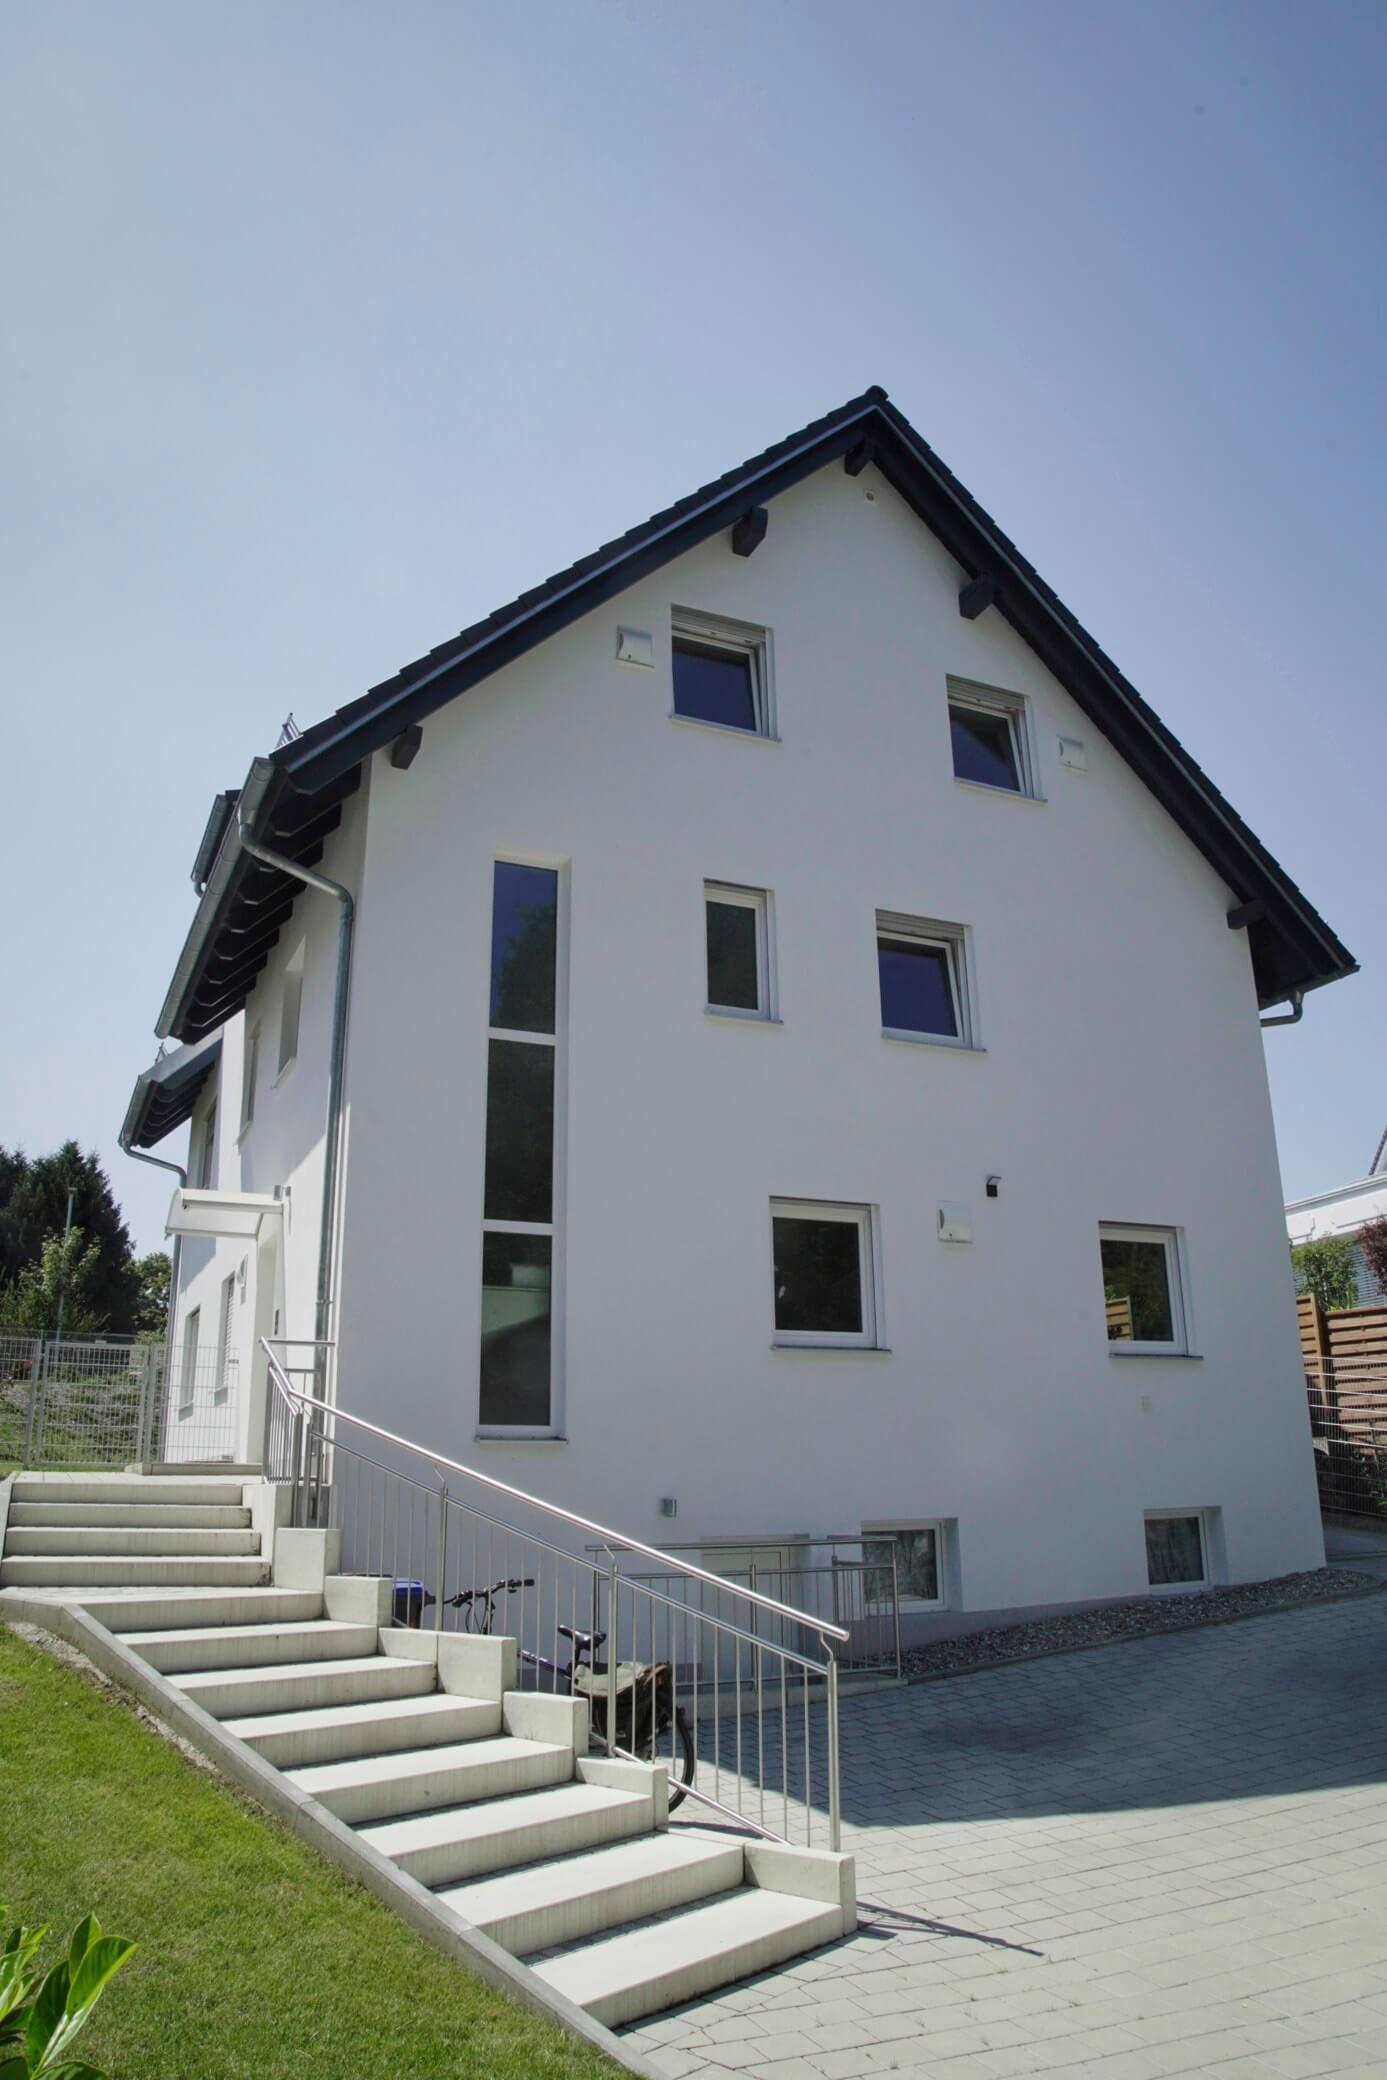 K&K Bau GmbH Massivhaus Referenzbild 8